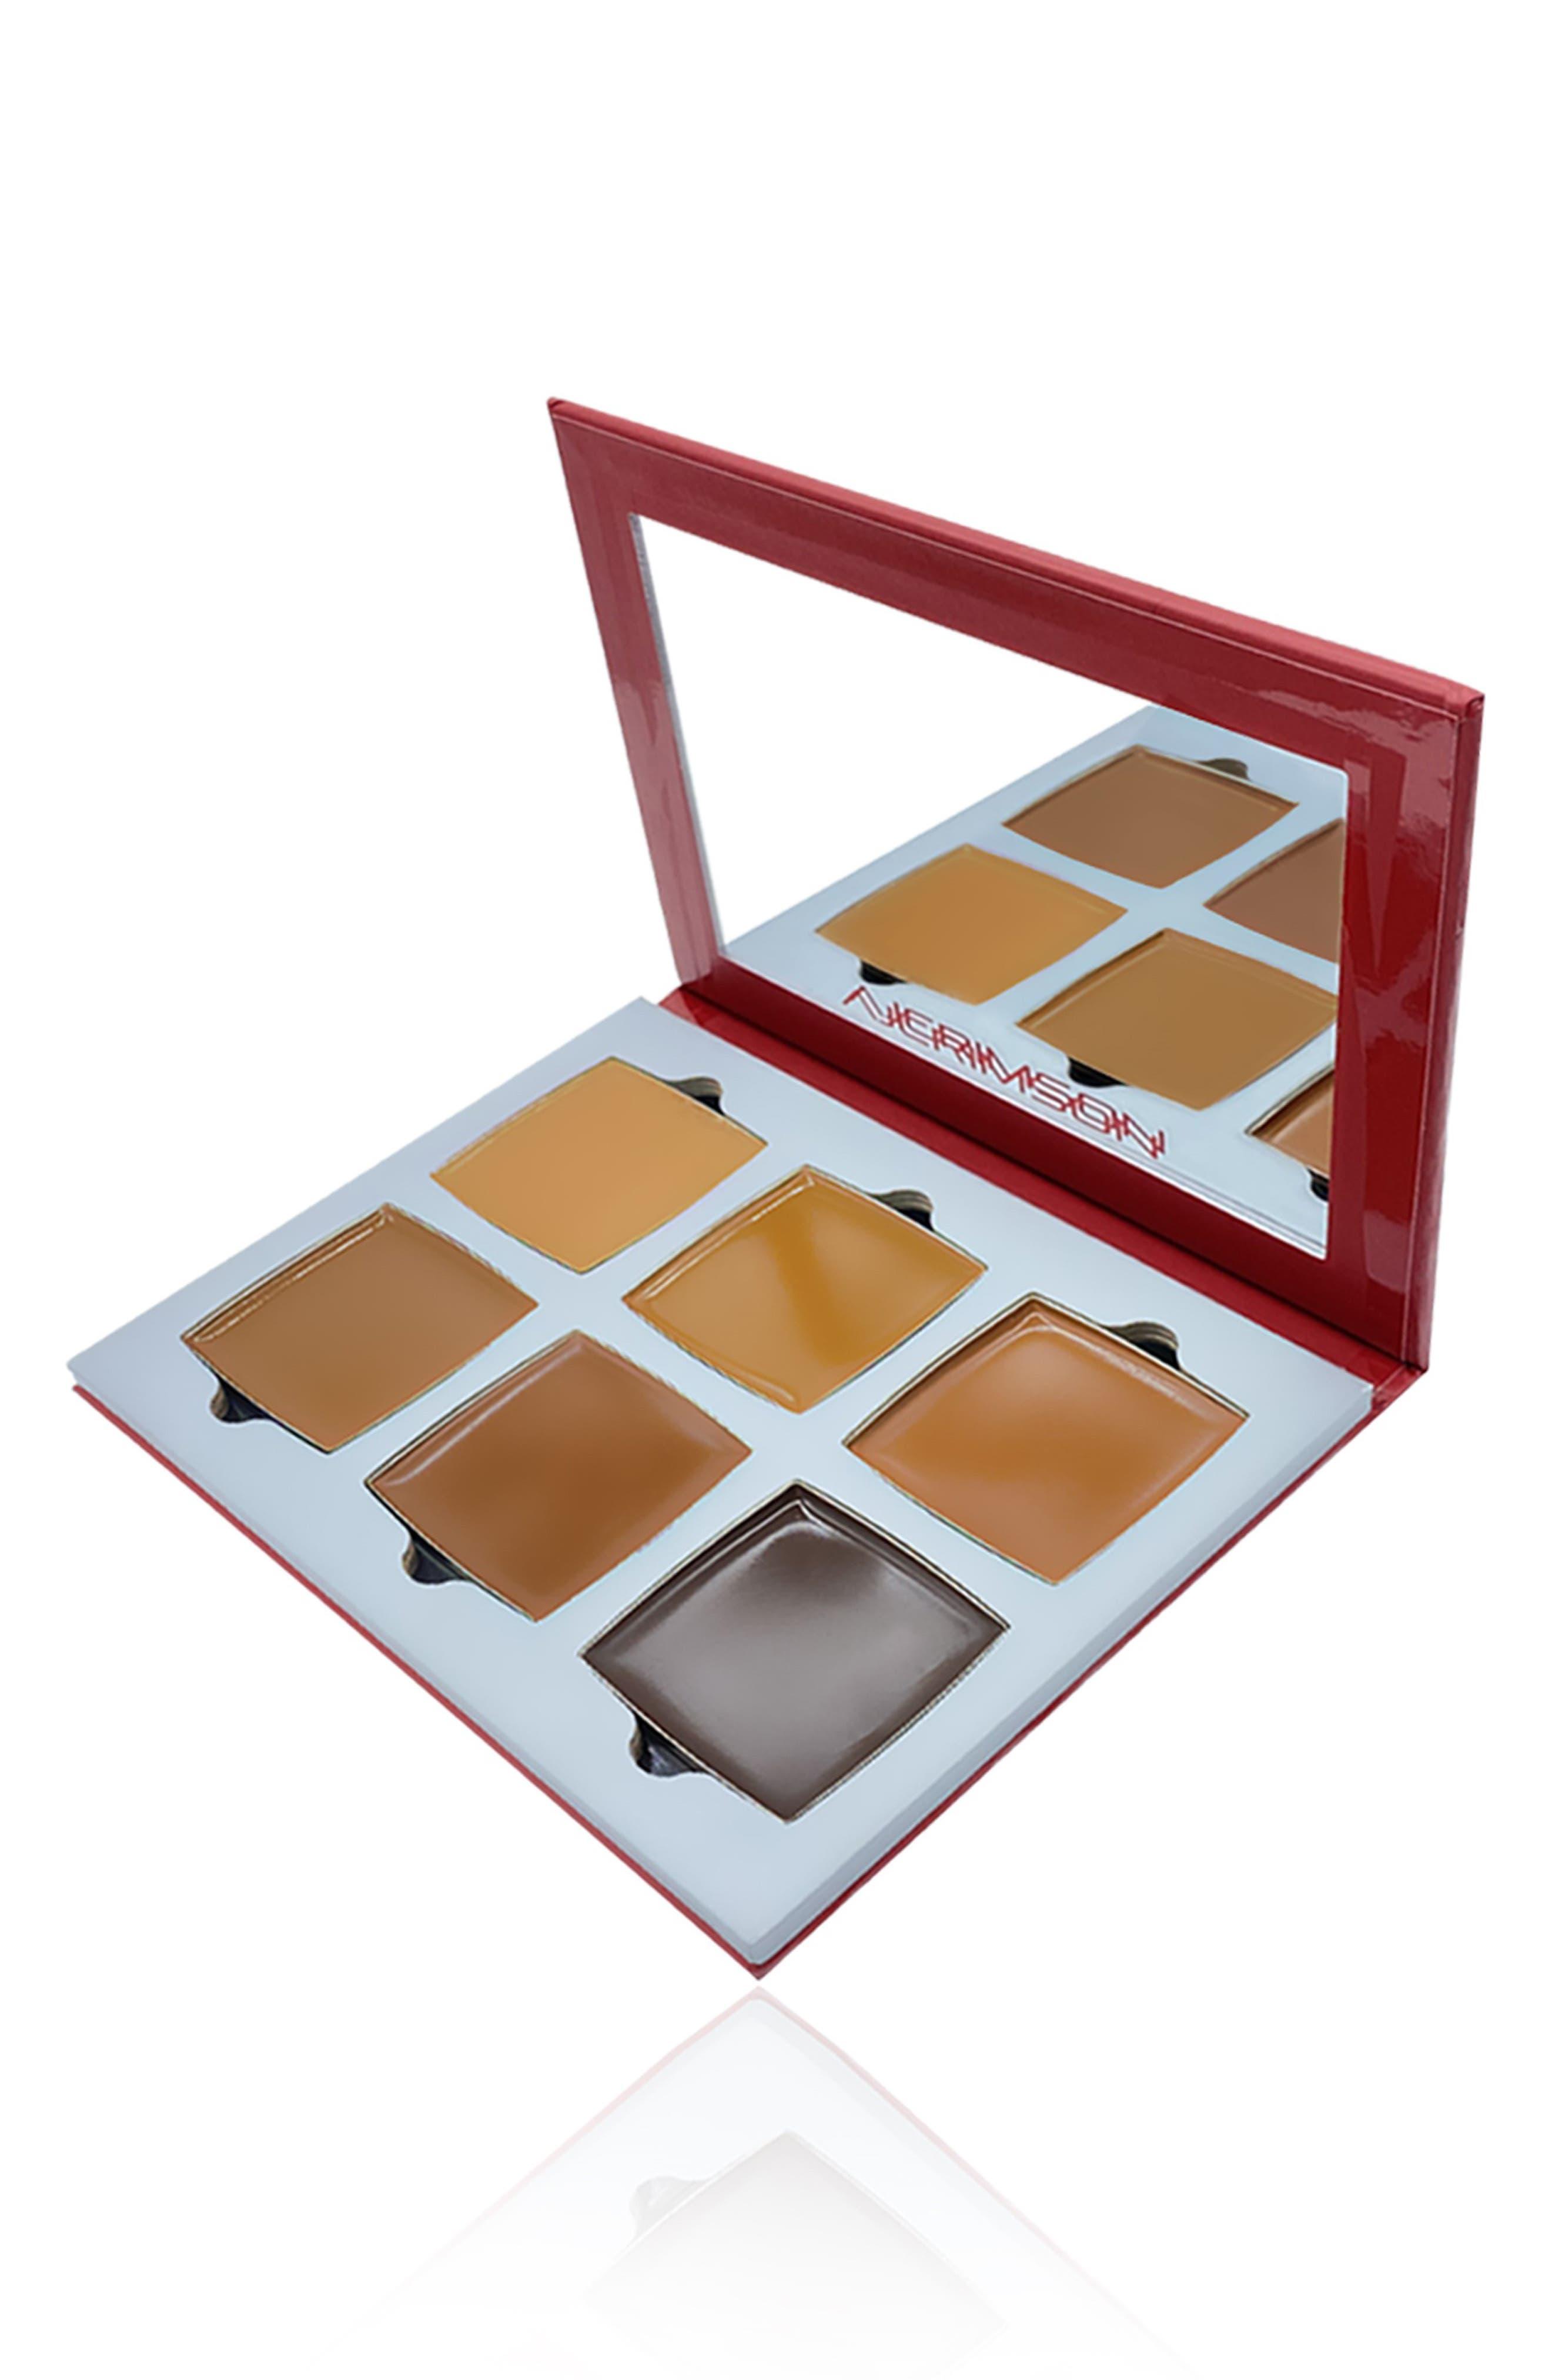 Artist Kit Dual Skin Creme Foundation Palette